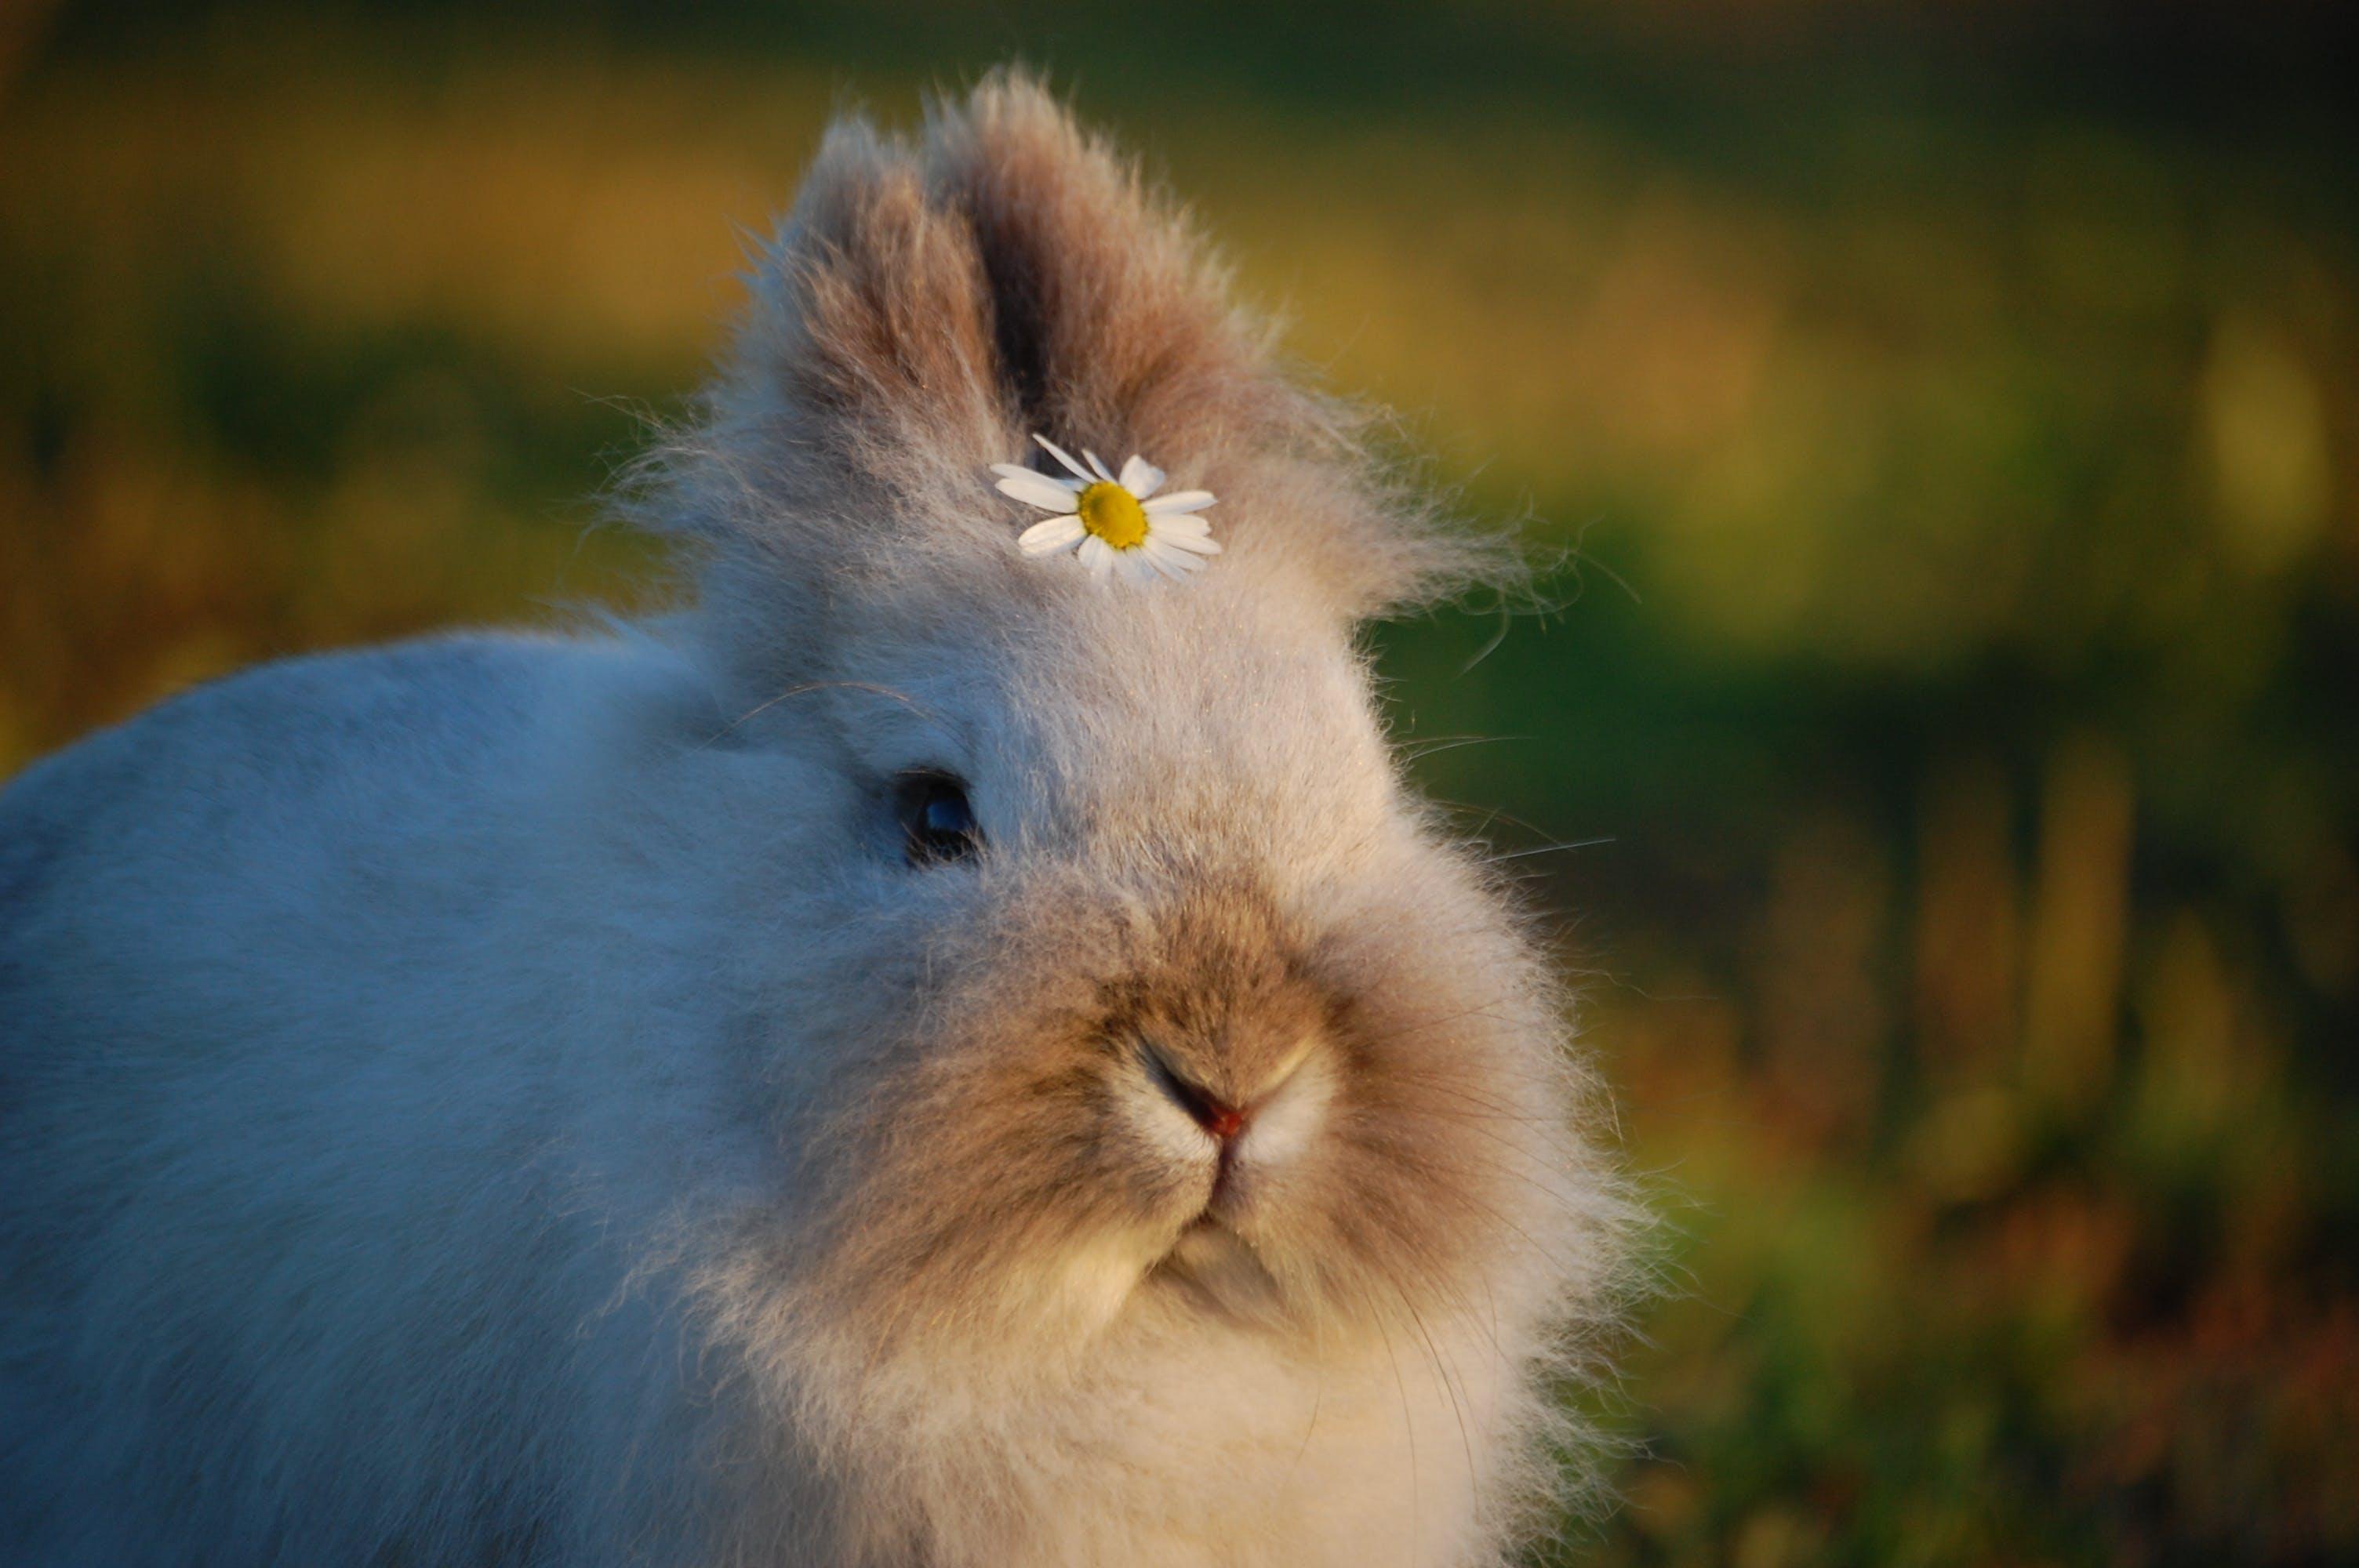 Gratis arkivbilde med blomst, dagslys, dyr, dyrefotografering